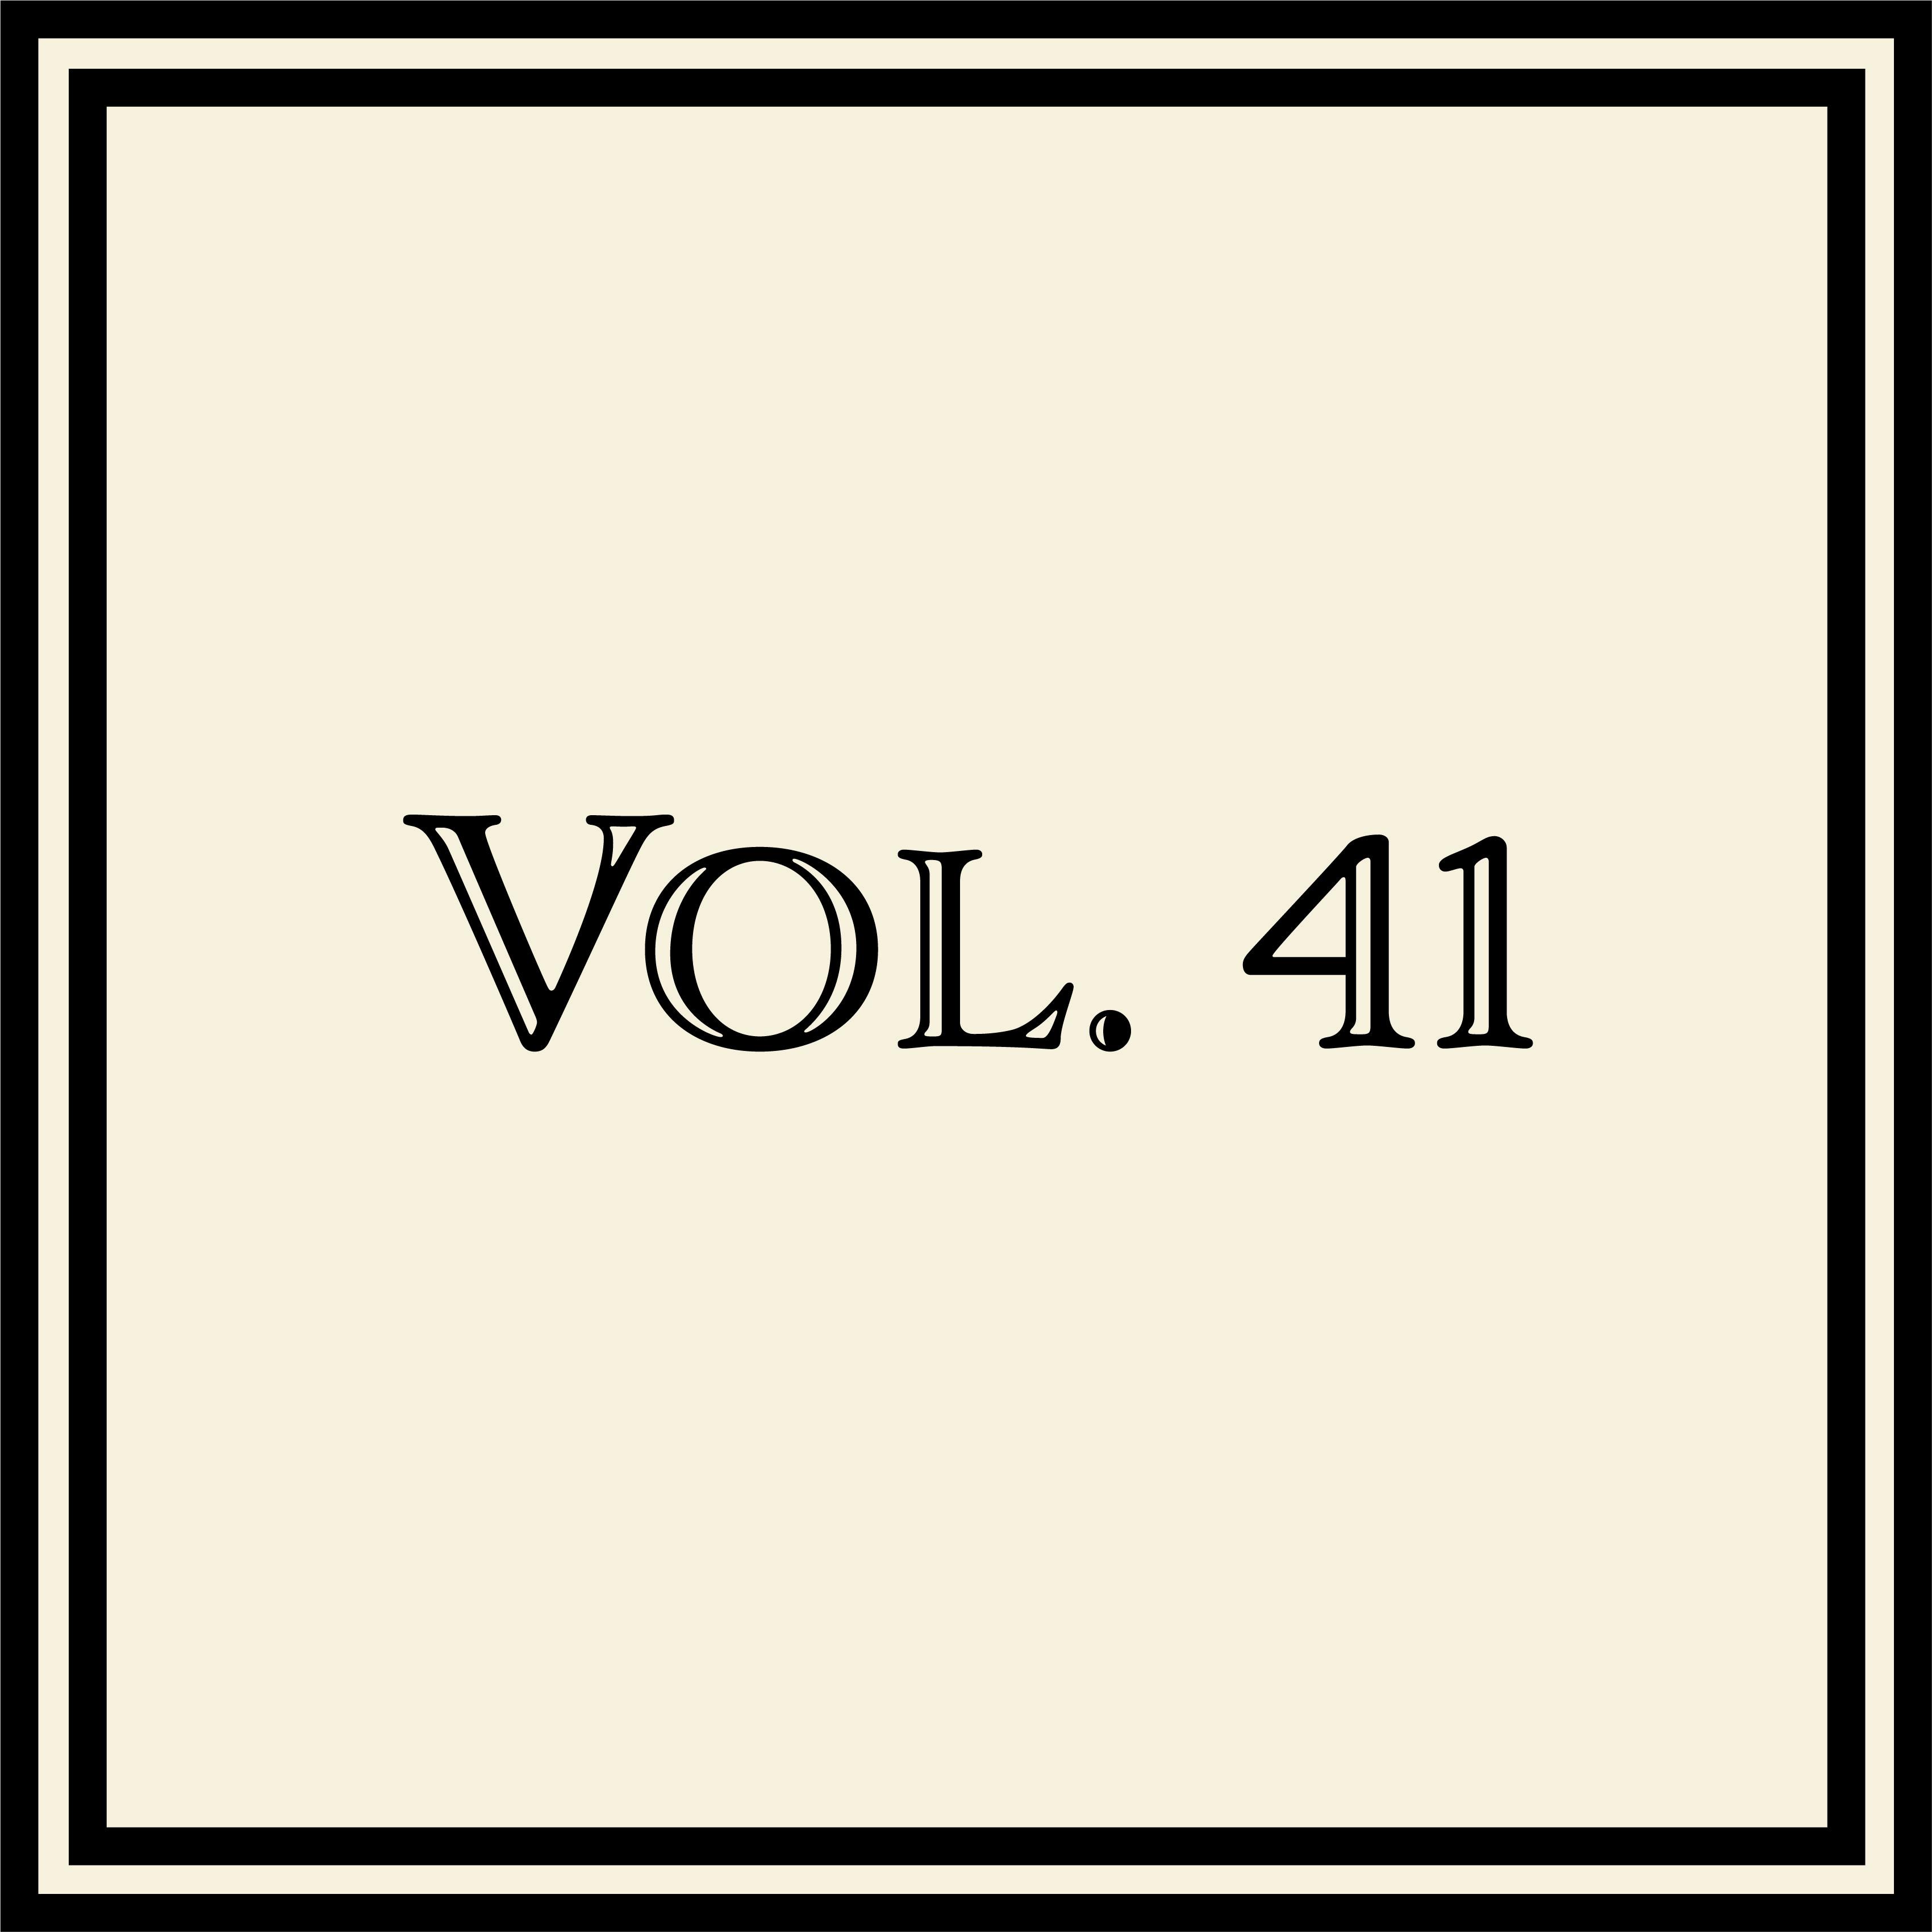 volume 41